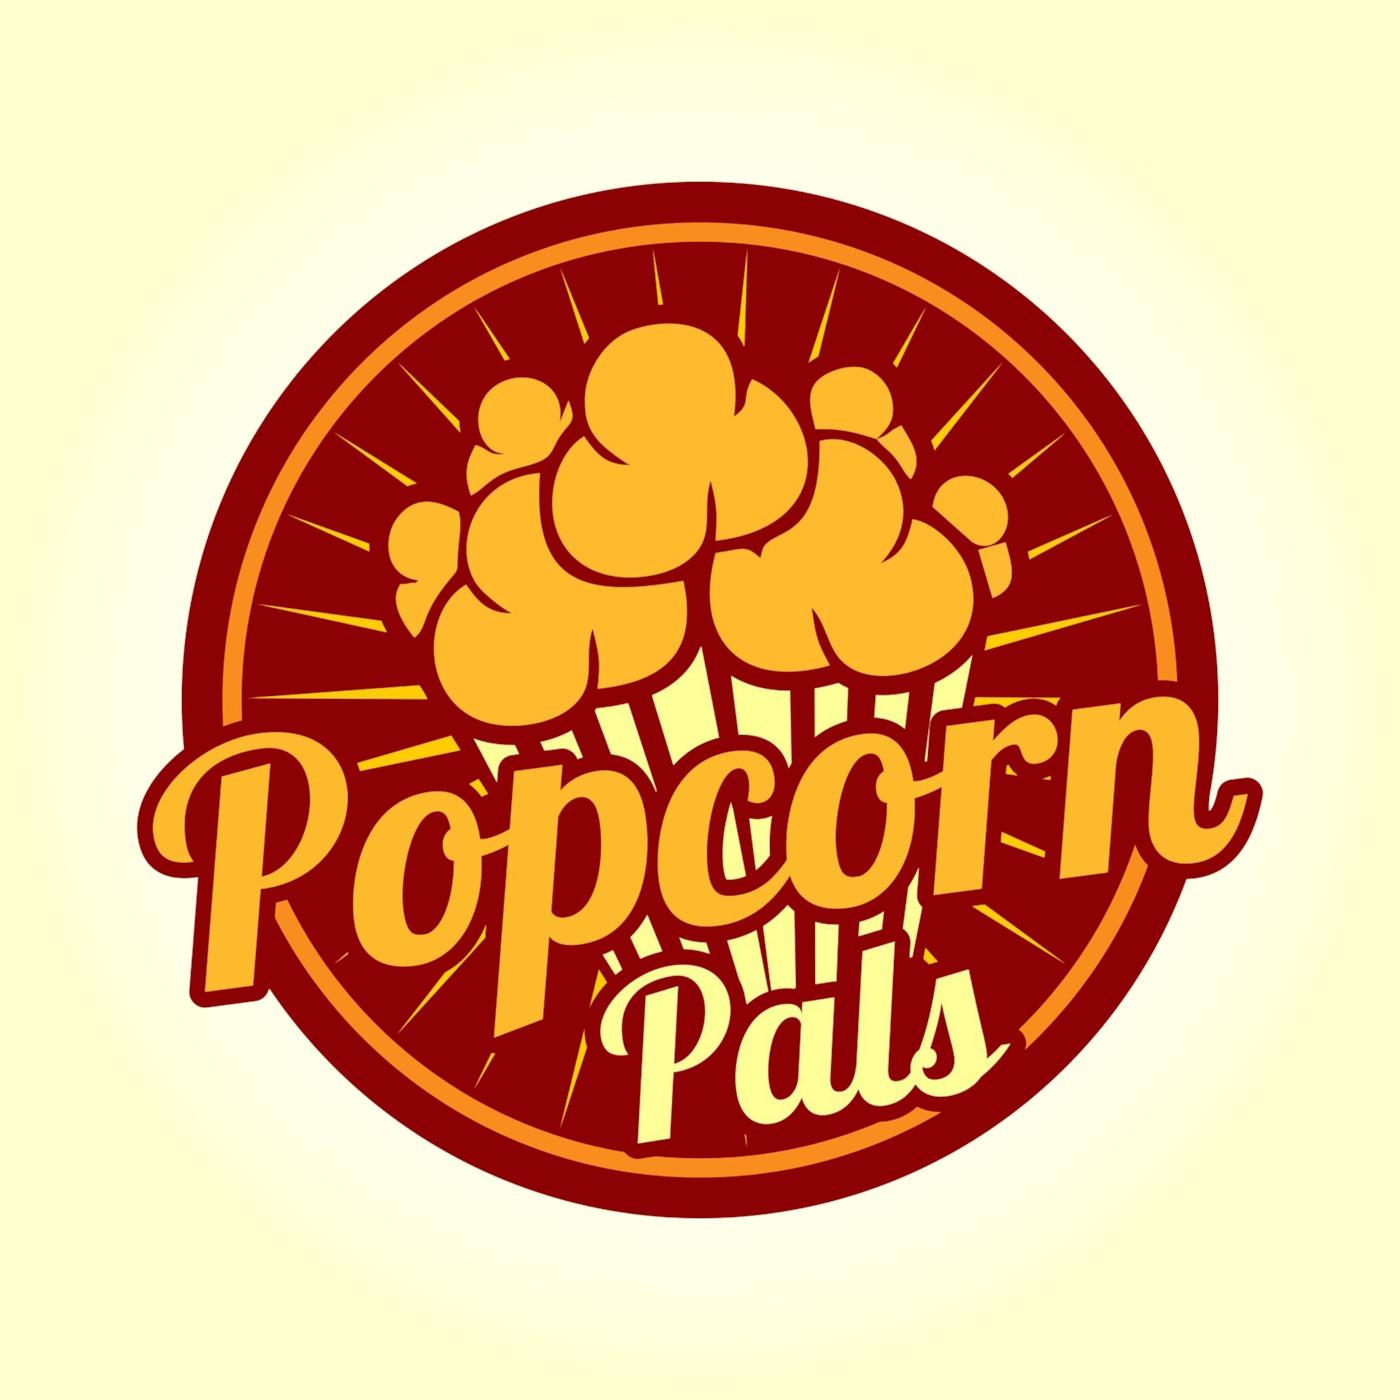 Popcorn Pals